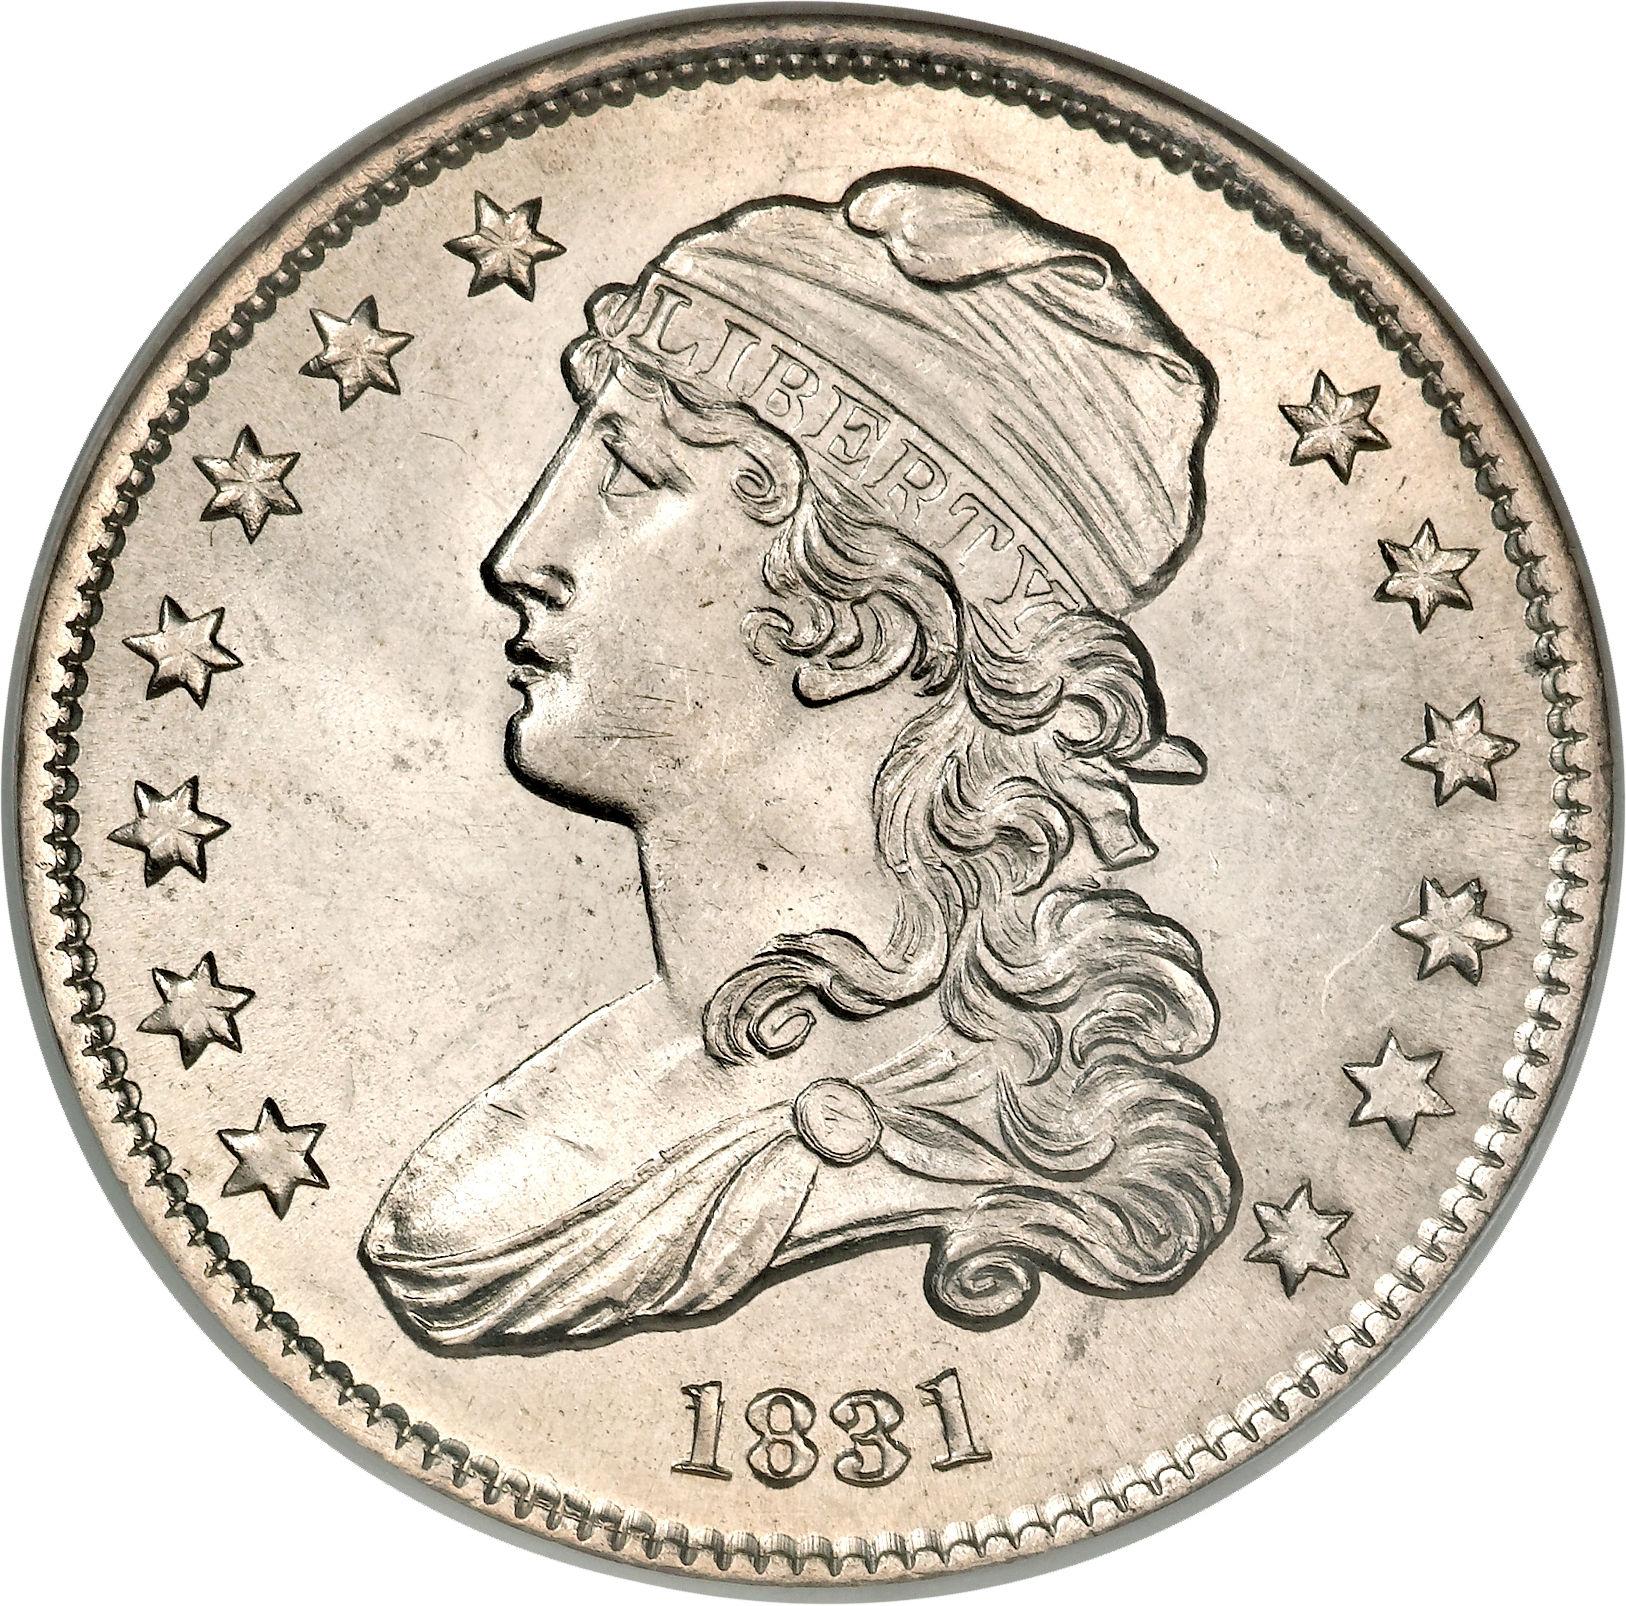 25 Cents Liberty Cap Quarter Without Motto